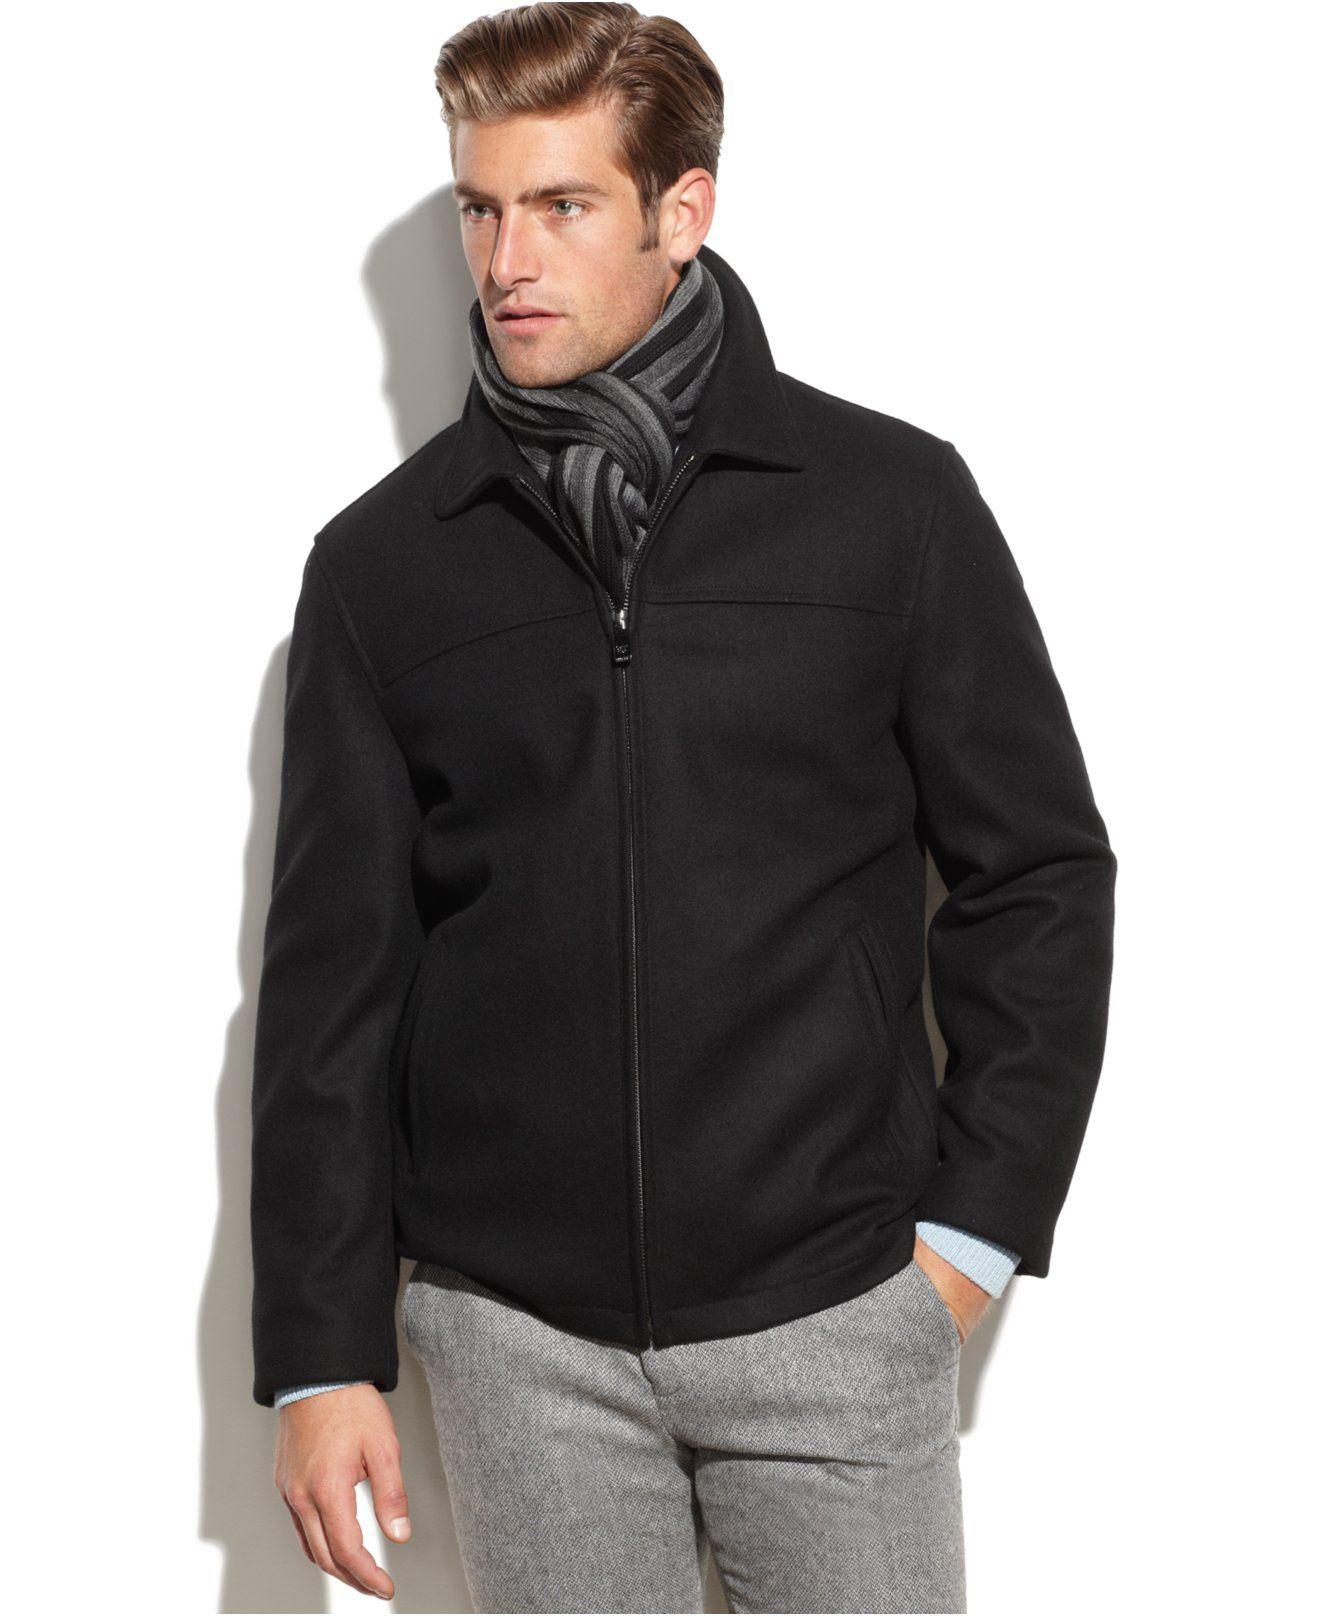 Calvin Klein Solid Wool Blend Overcoat With Scarf Coats Jackets Men Macy S Http Www1 Macys Com Shop Product Cal Overcoats Mens Jackets Coats Jackets [ 1616 x 1320 Pixel ]